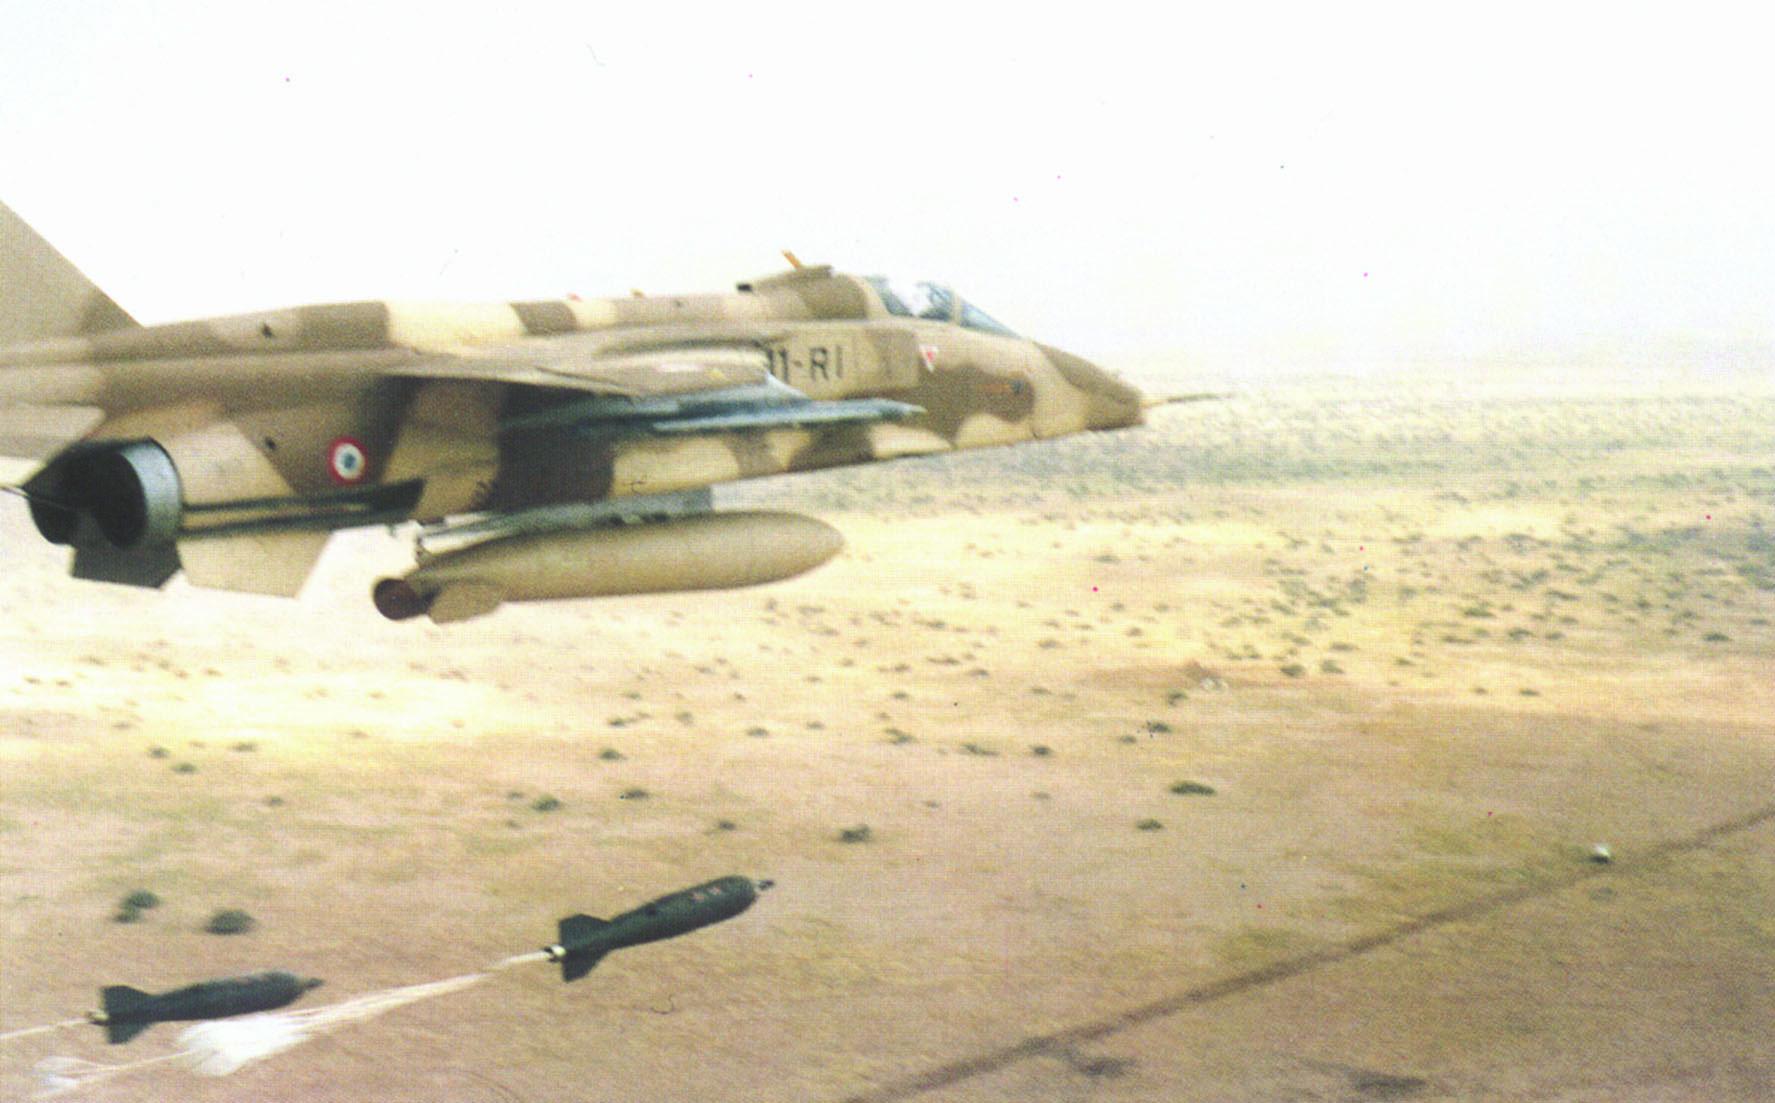 Tir bombe freinée